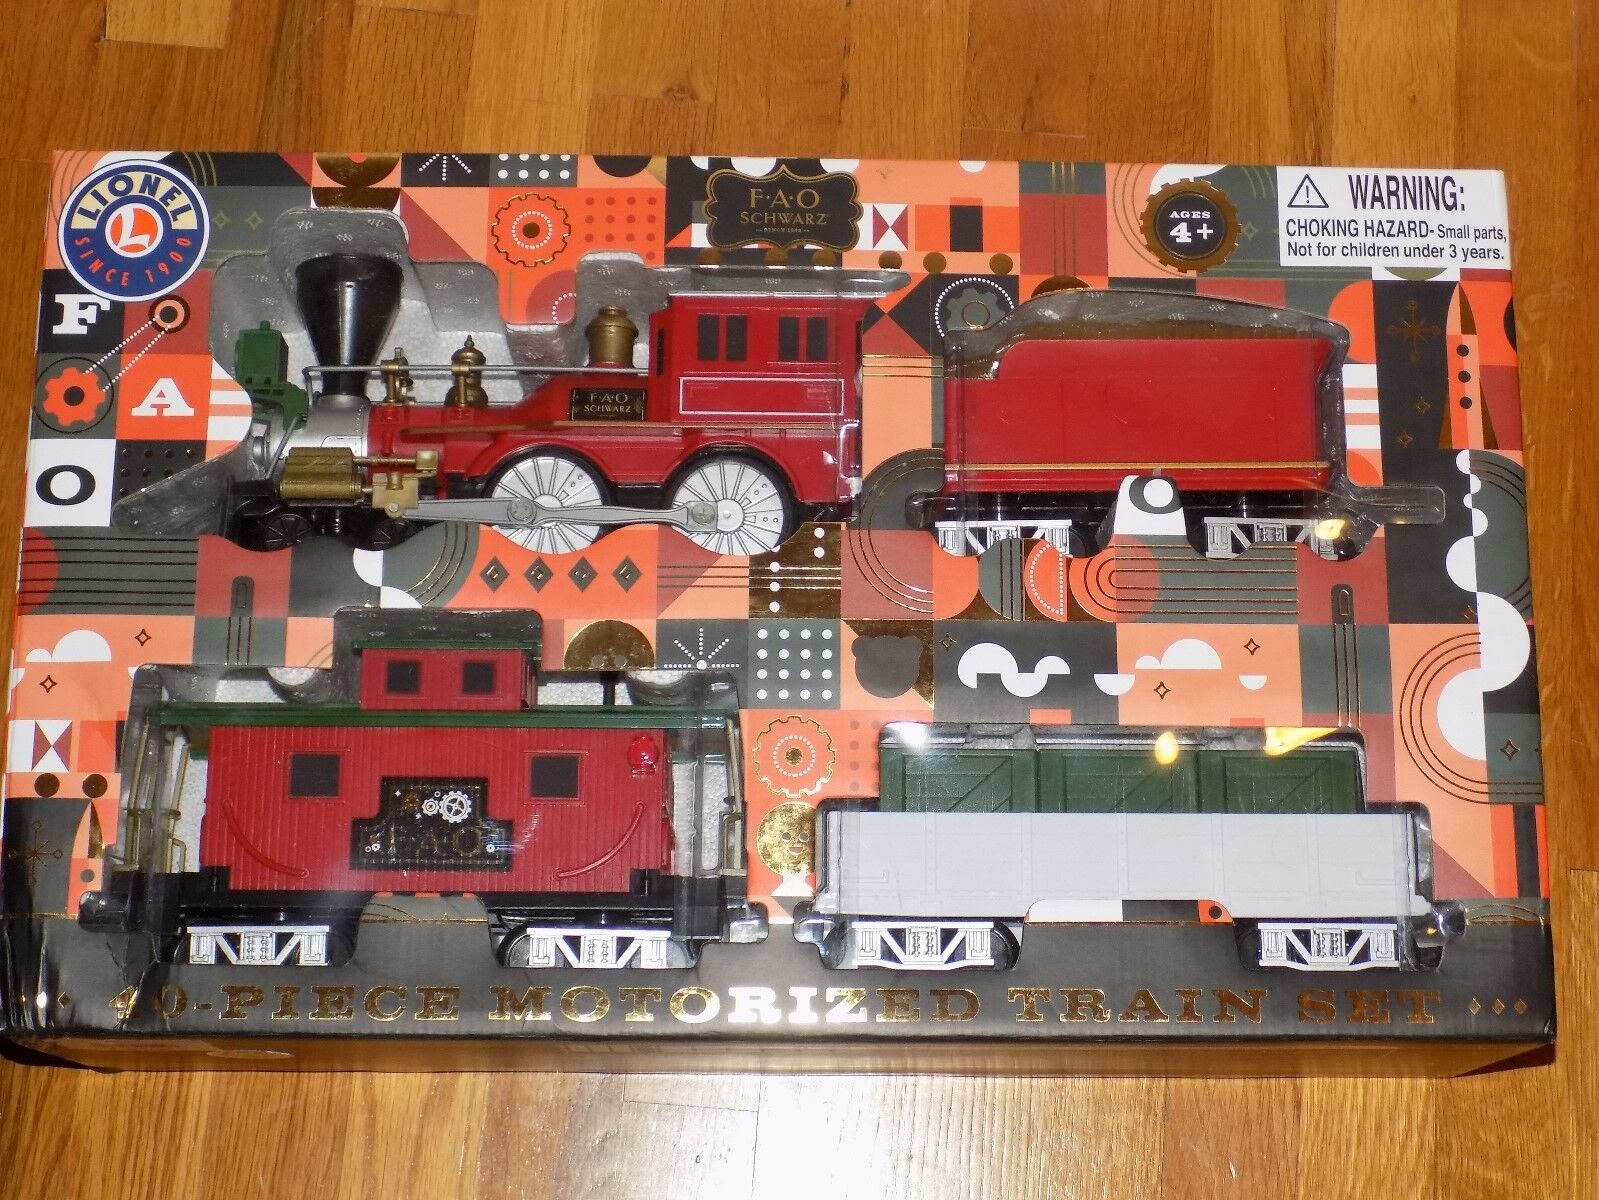 Lionel FAO nero- 40 Piece Motorized Train Set Set Set 0ca66e